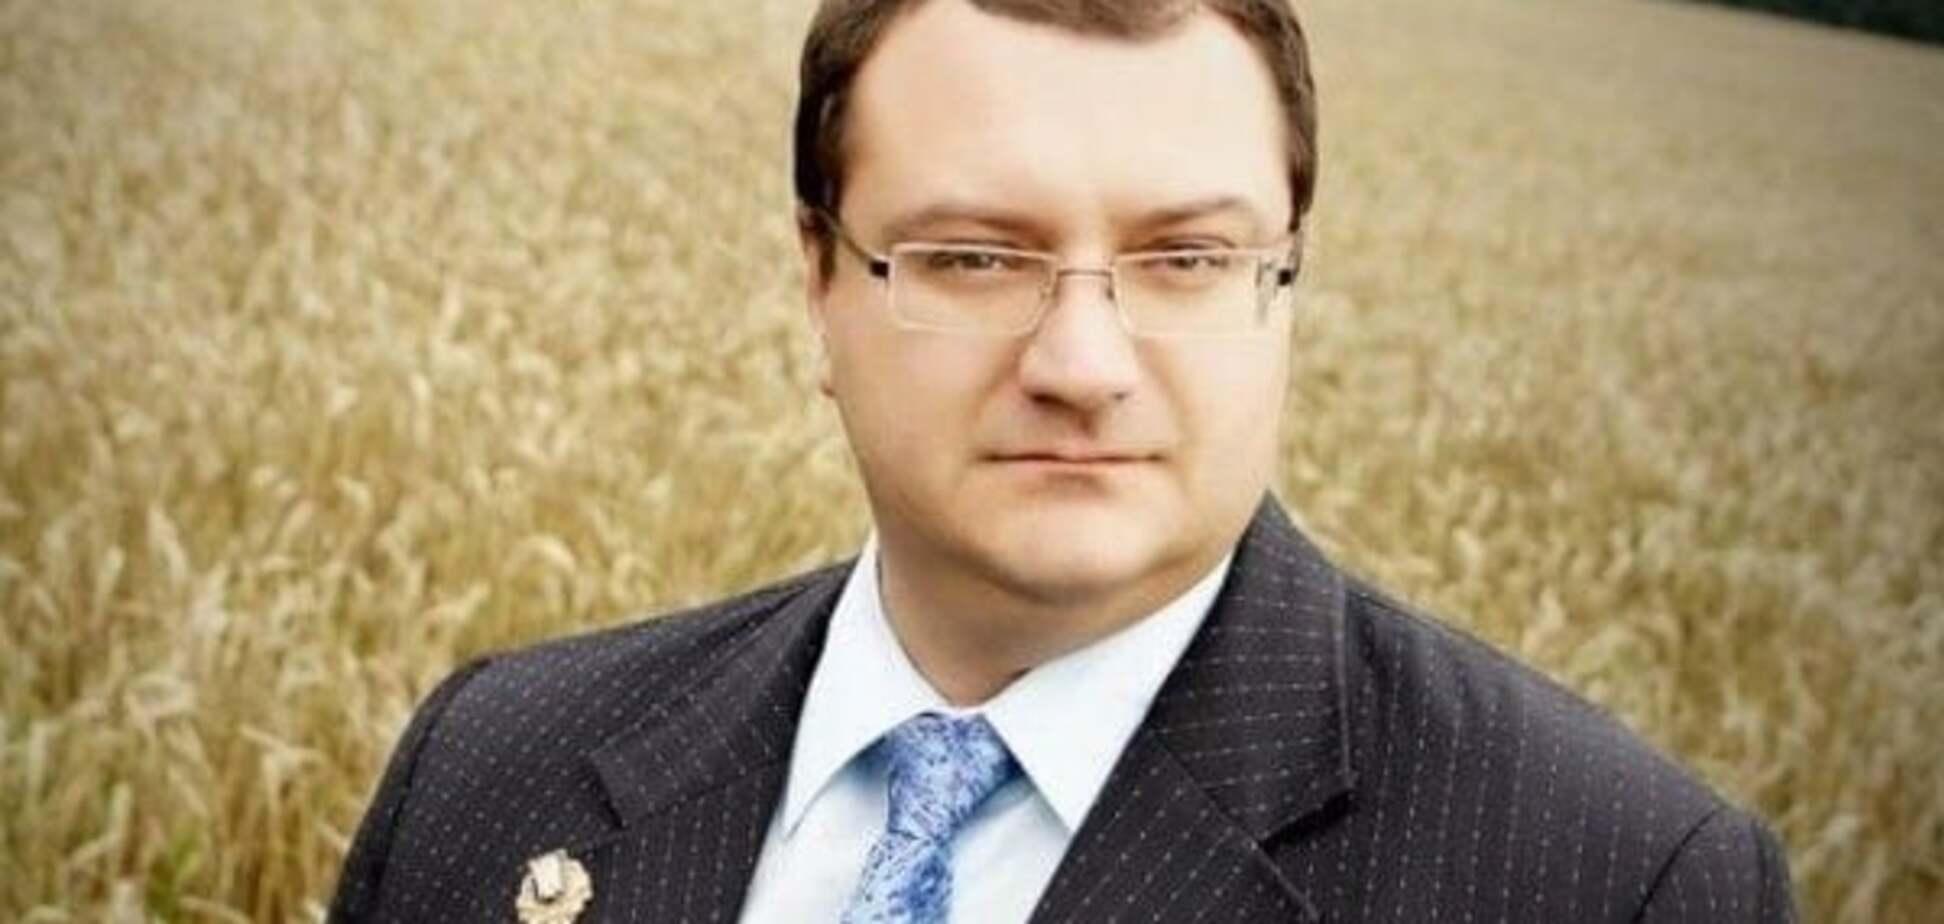 Адвокат розповів, як вплине вбивство адвоката ГРУшника на обмін Савченко